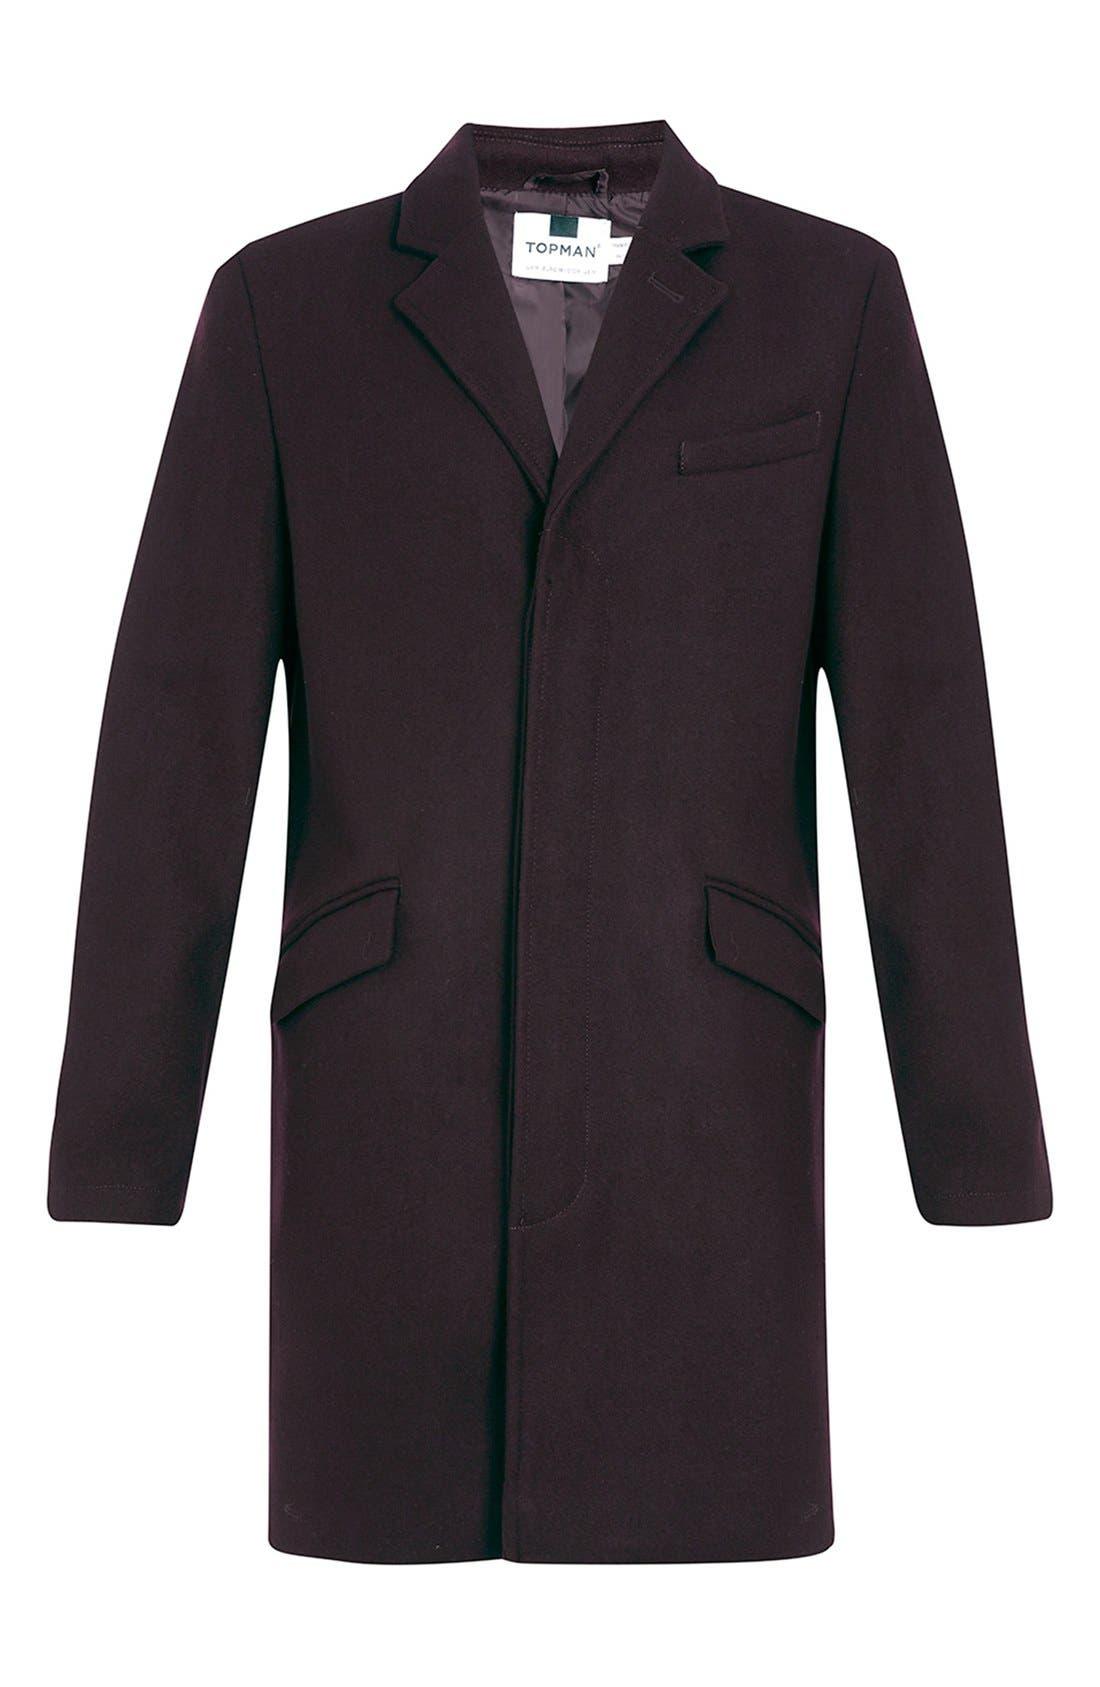 Burgundy Topcoat,                             Alternate thumbnail 3, color,                             930